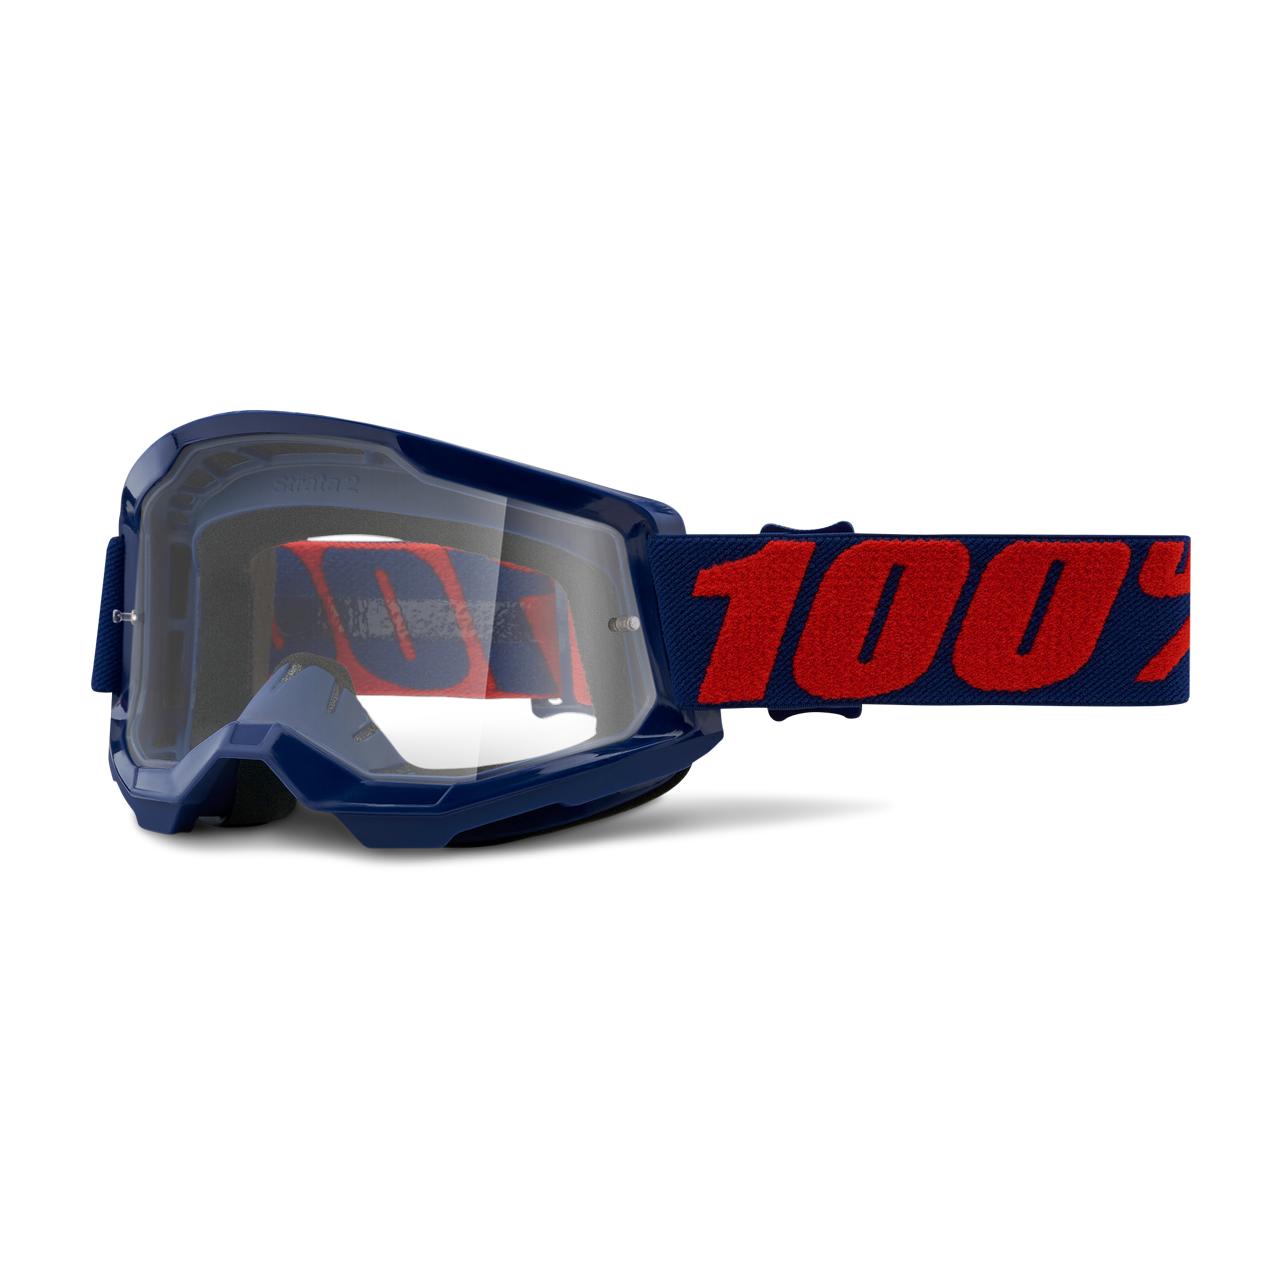 100% Masque Cross 100% Strata 2 Masego Bleu Foncé-Rouge